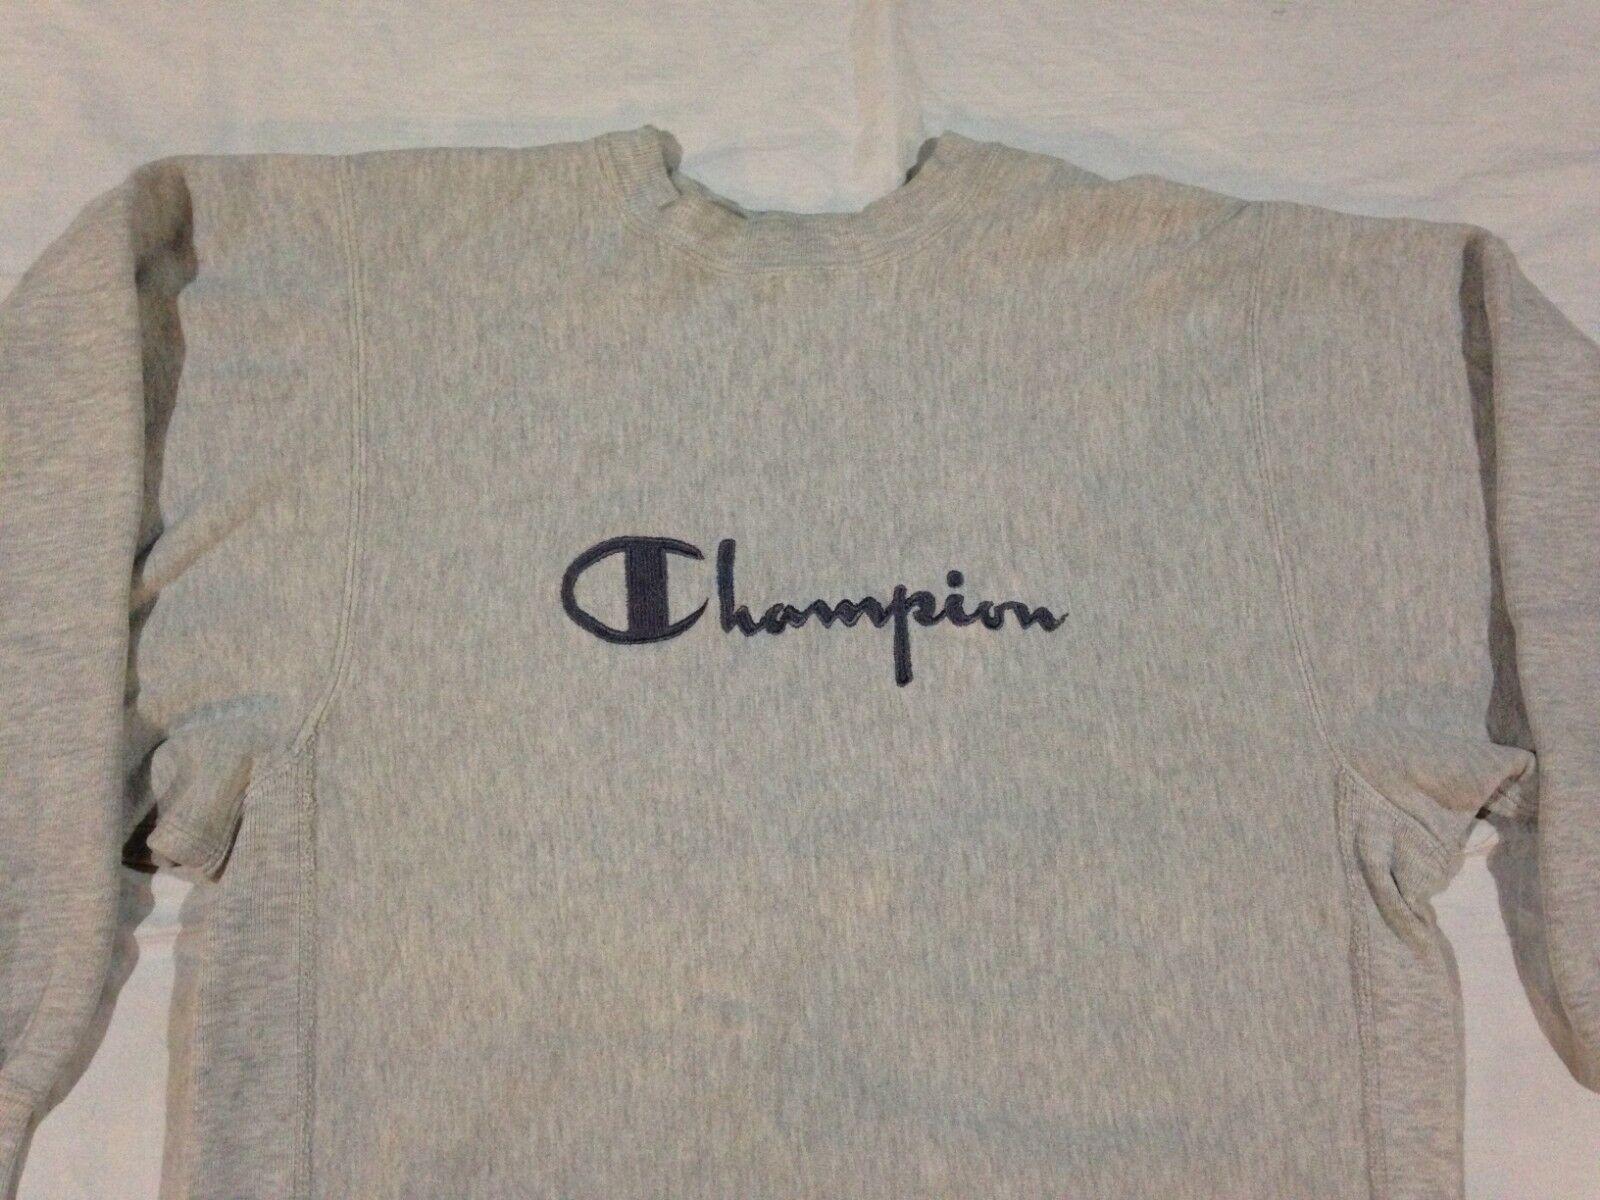 VTG 90'S CHAMPION SWEATER REVERSE WEAVE SCRIPT SWEATER CHAMPION grau LARGE d6e140